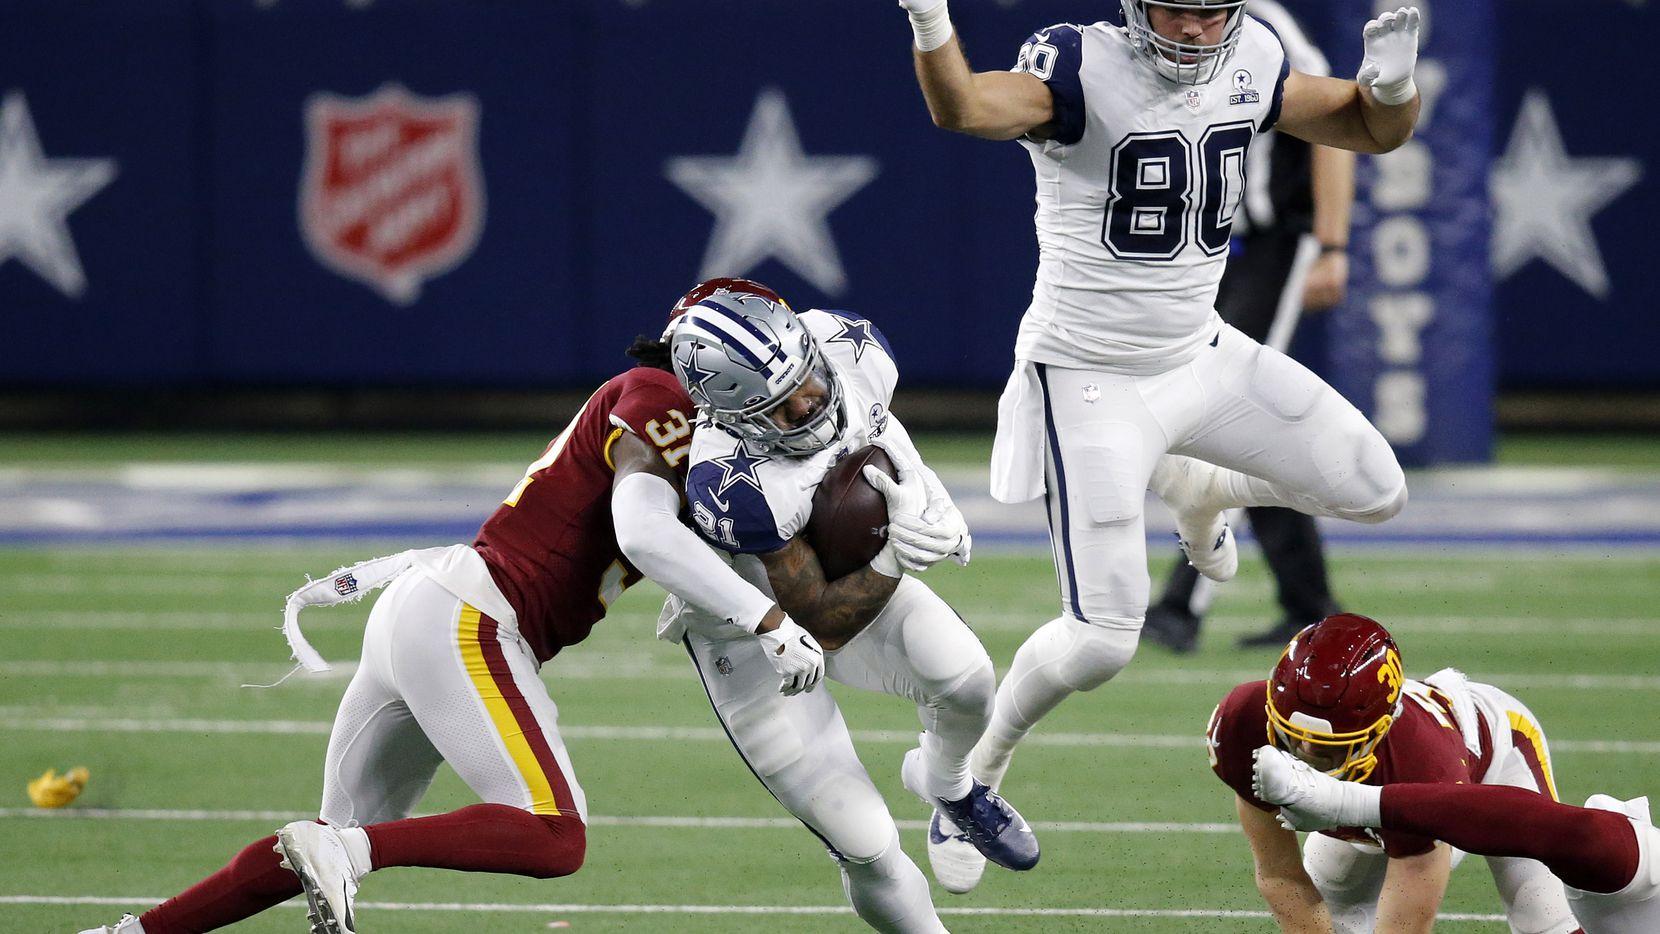 Cowboys running back Ezekiel Elliott (21) is wrapped up by Washington safety Kamren Curl (31) during a third-quarter run at AT&T Stadium in Arlington on Thursday, Nov. 26, 2020.